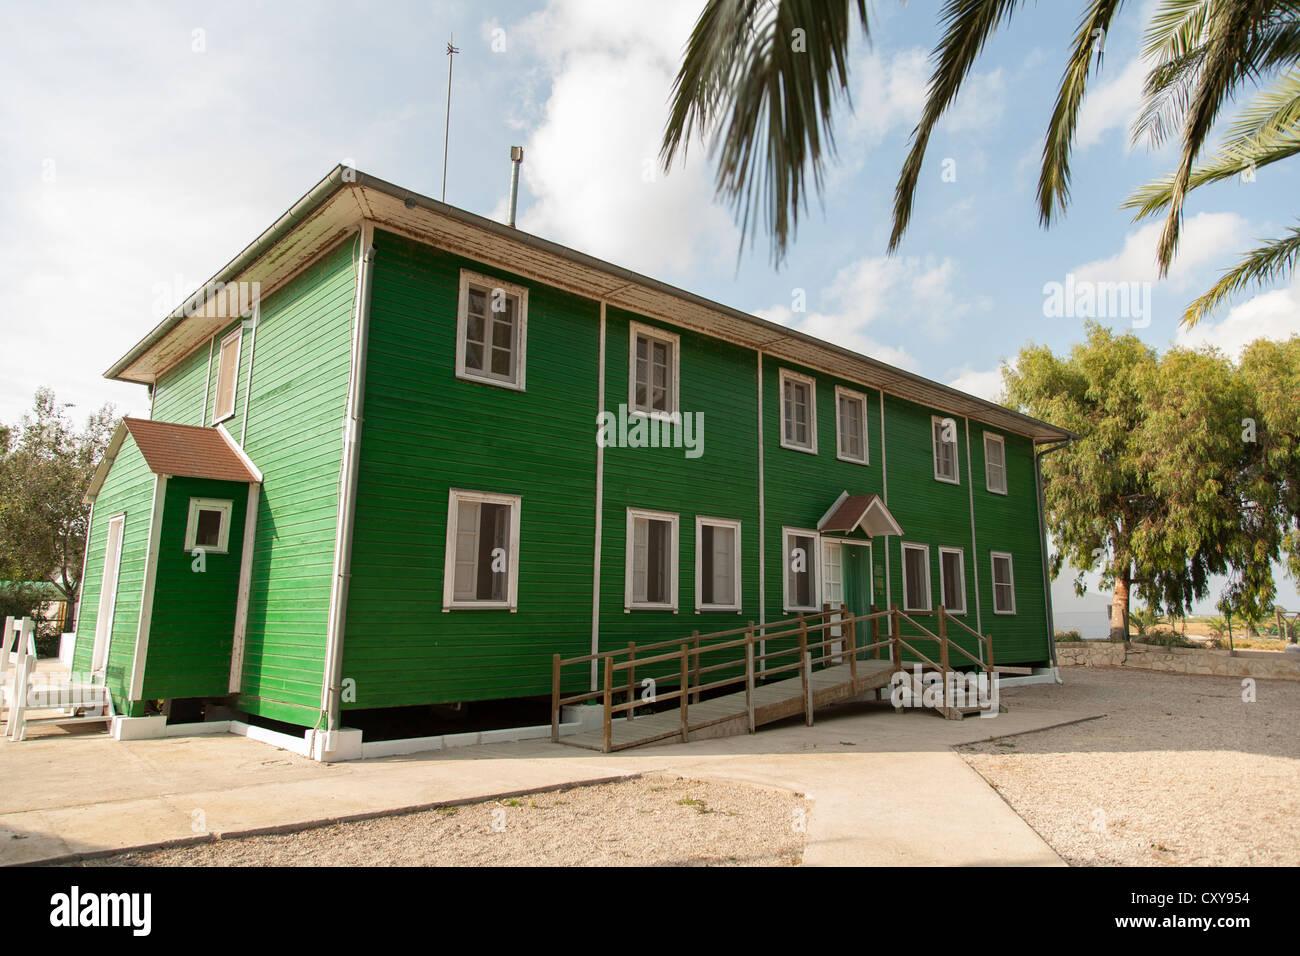 Casa De Fusta Wooden House Information Center And An